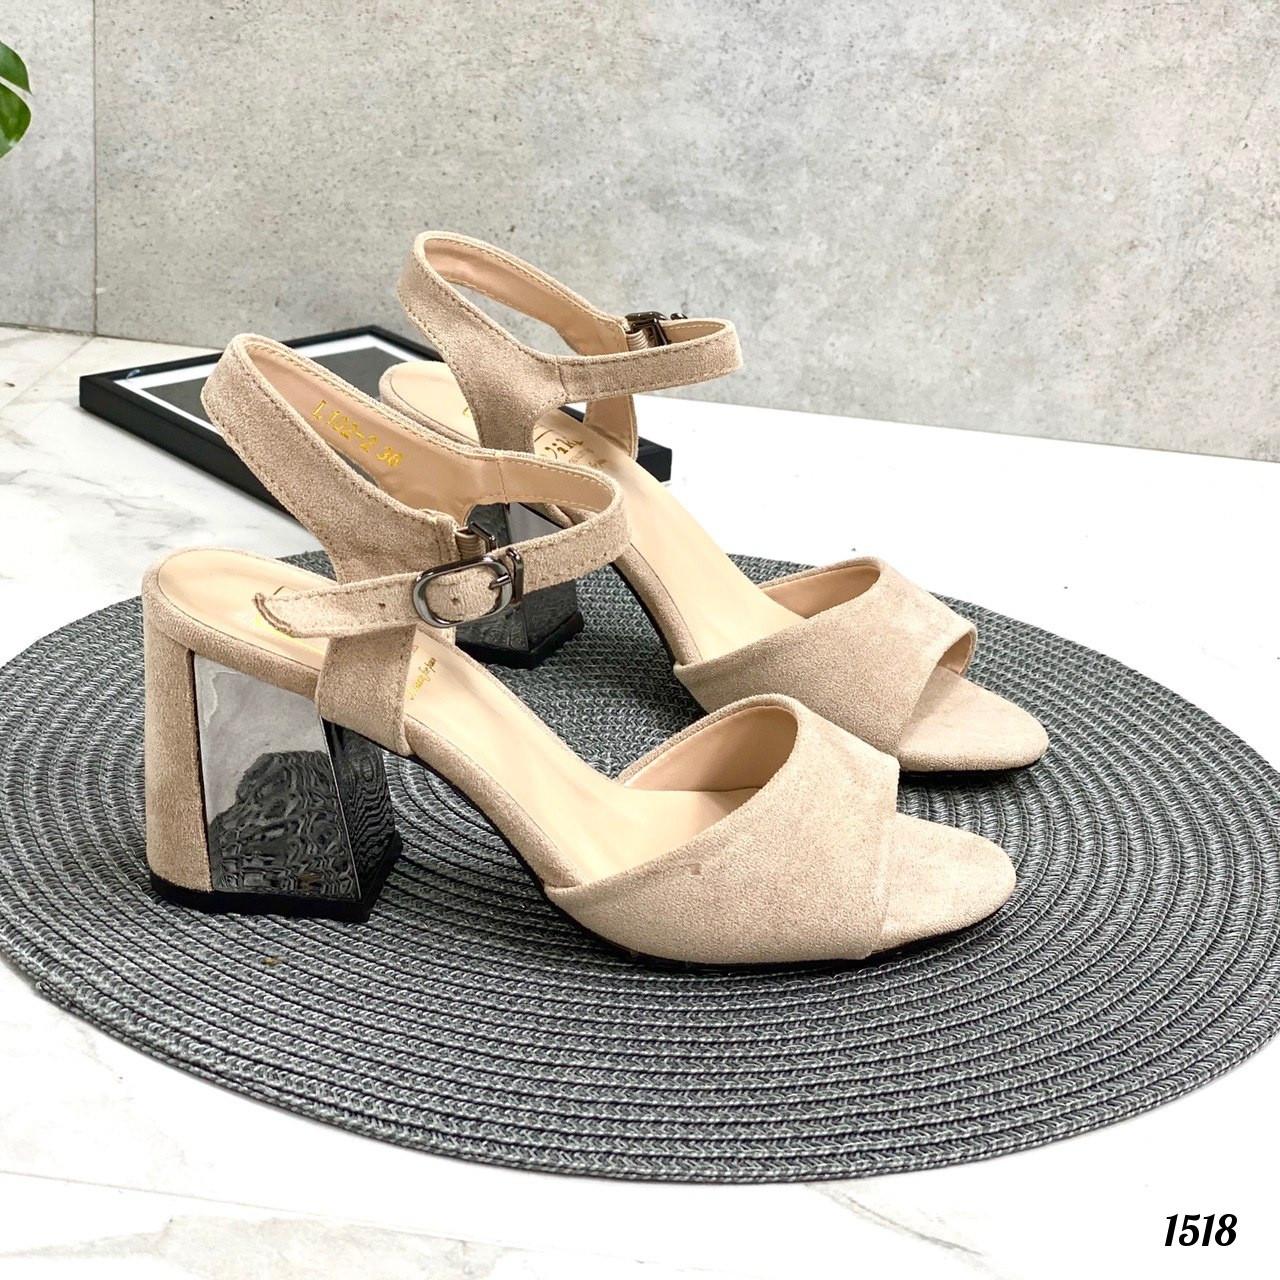 Женские босоножки бежевые - беж на каблуке 10 см эко-замш